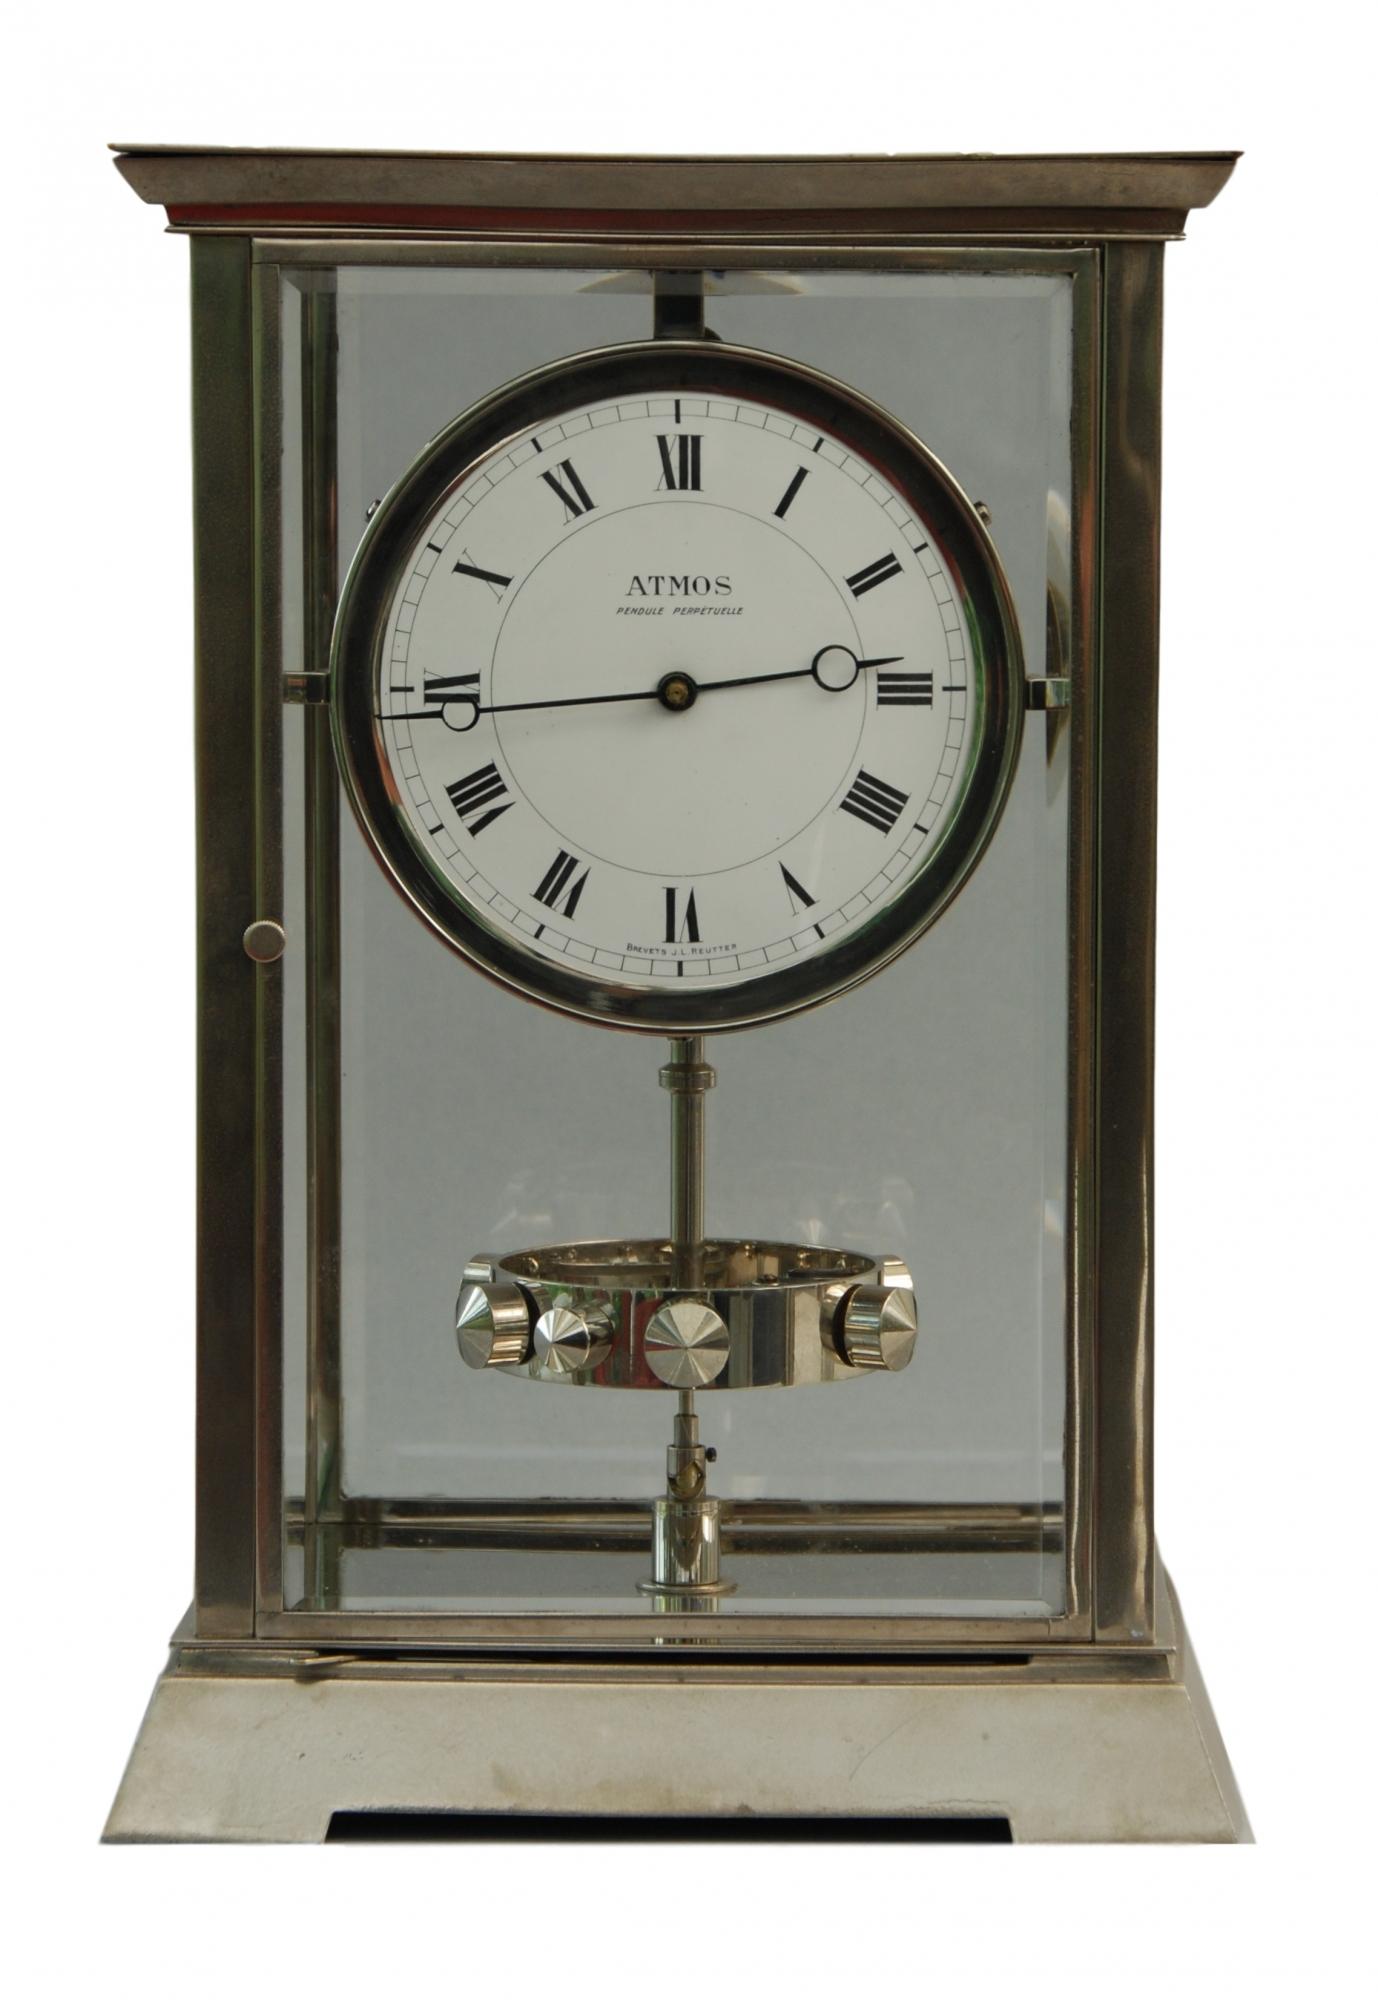 M204 Nickel Art Deco Style J L Reutter Atmos Four Glass Atmos Clock Tall Version Artlistings